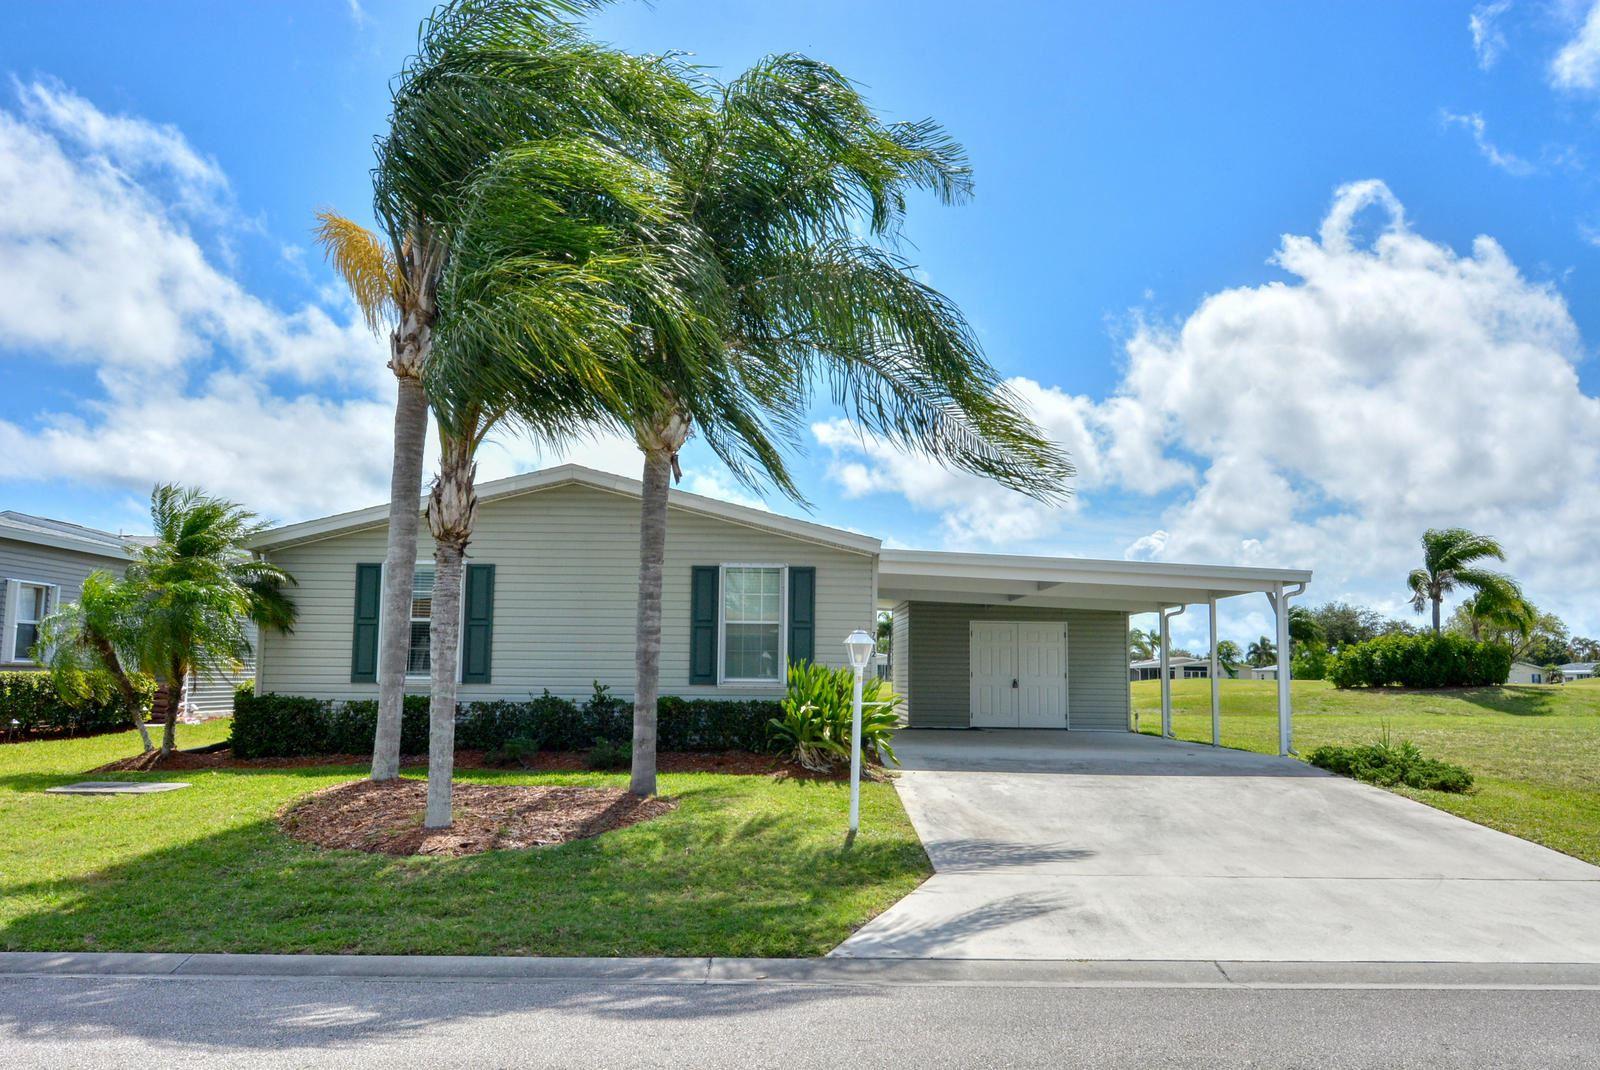 7912 Mcclintock Way, Port Saint Lucie, FL 34952 - #: RX-10622951